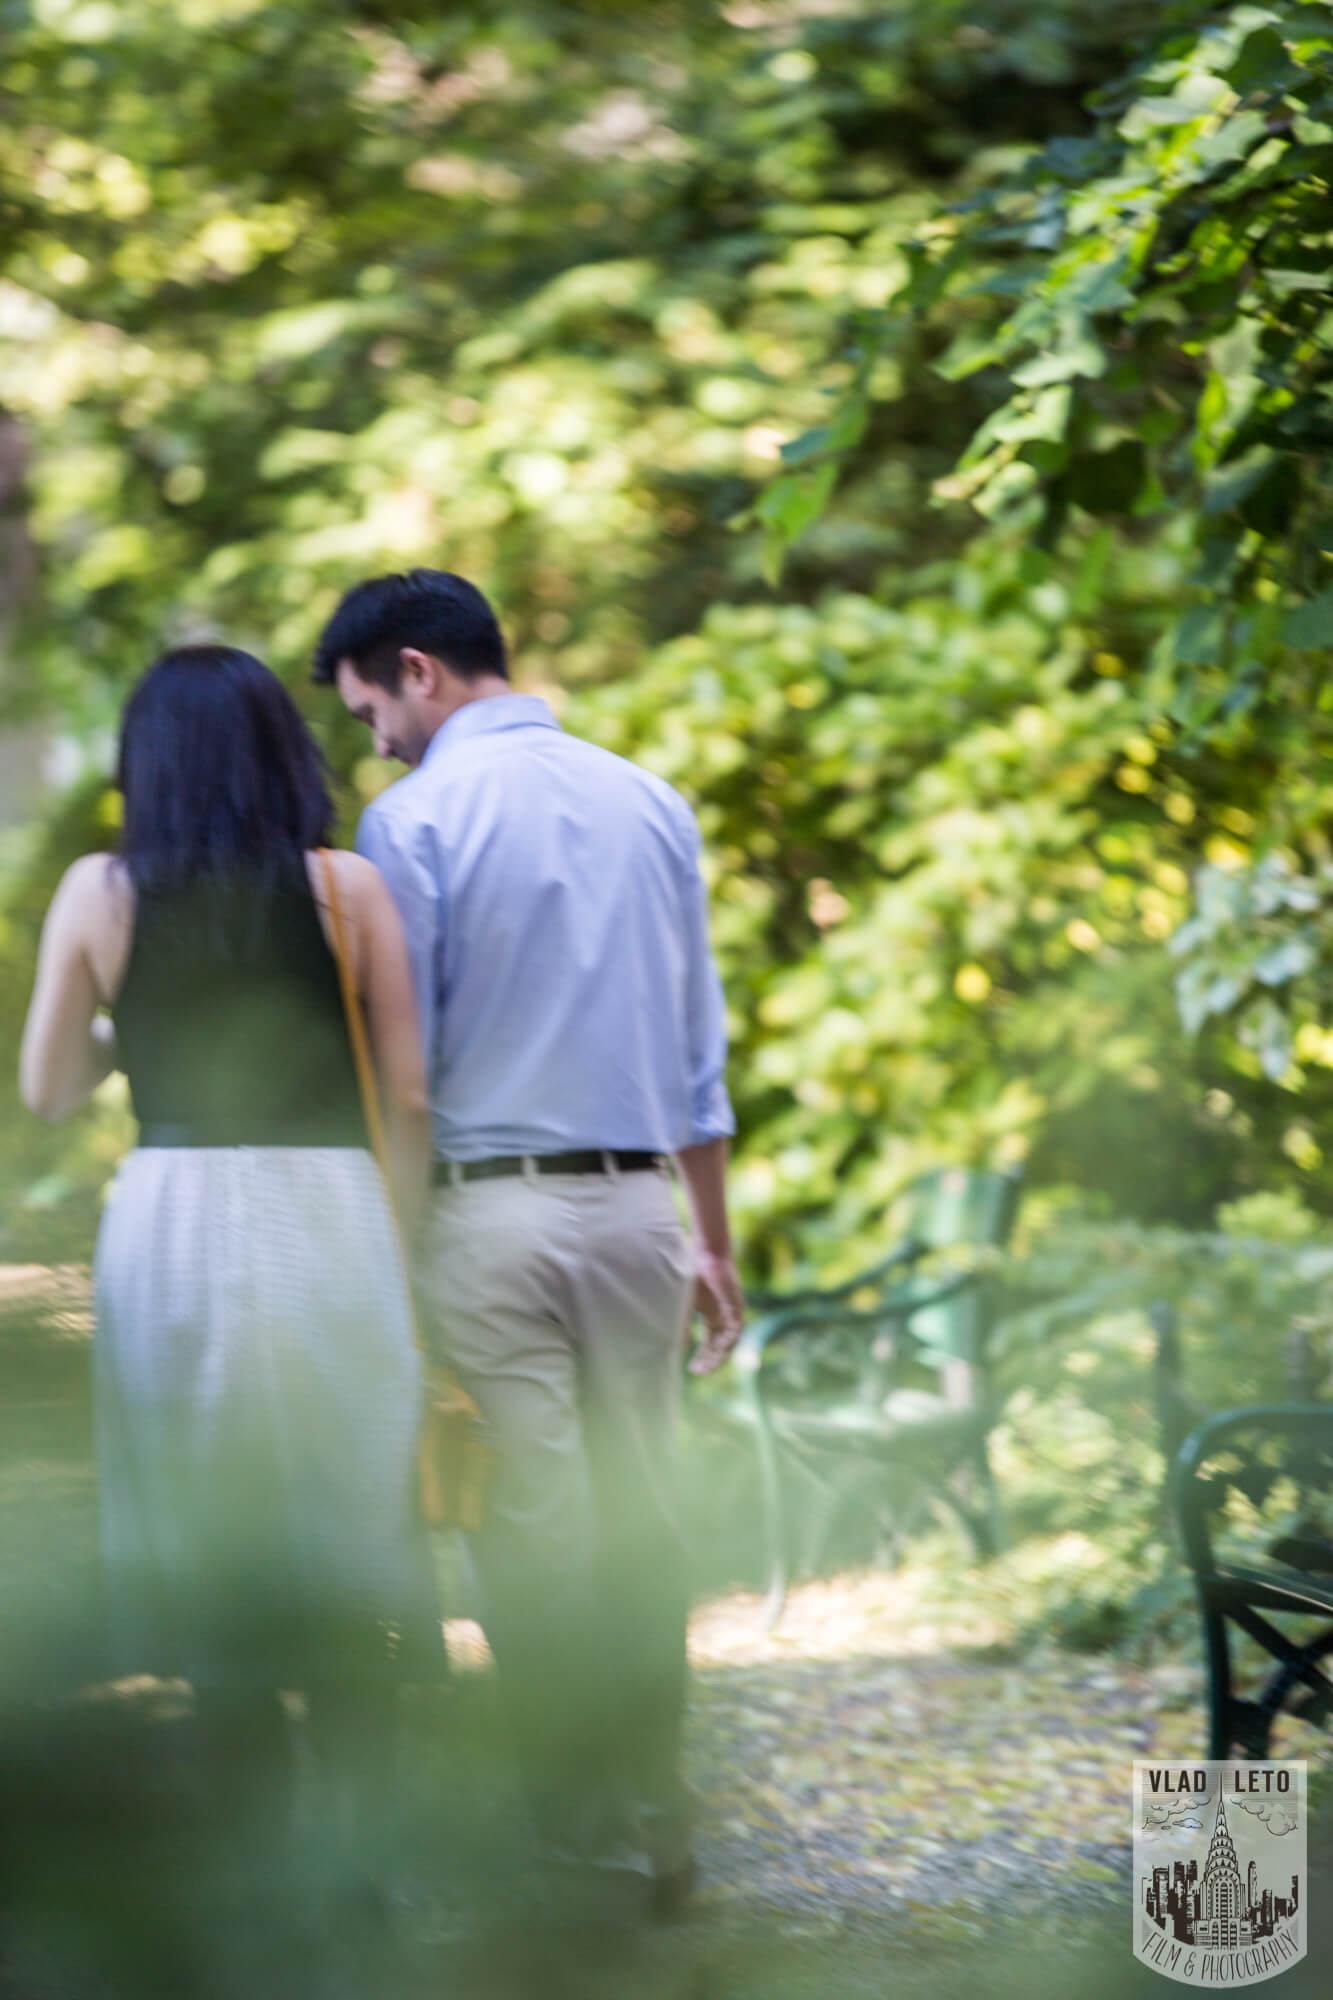 Photo 2 Gramercy Park Marriage Proposal   VladLeto